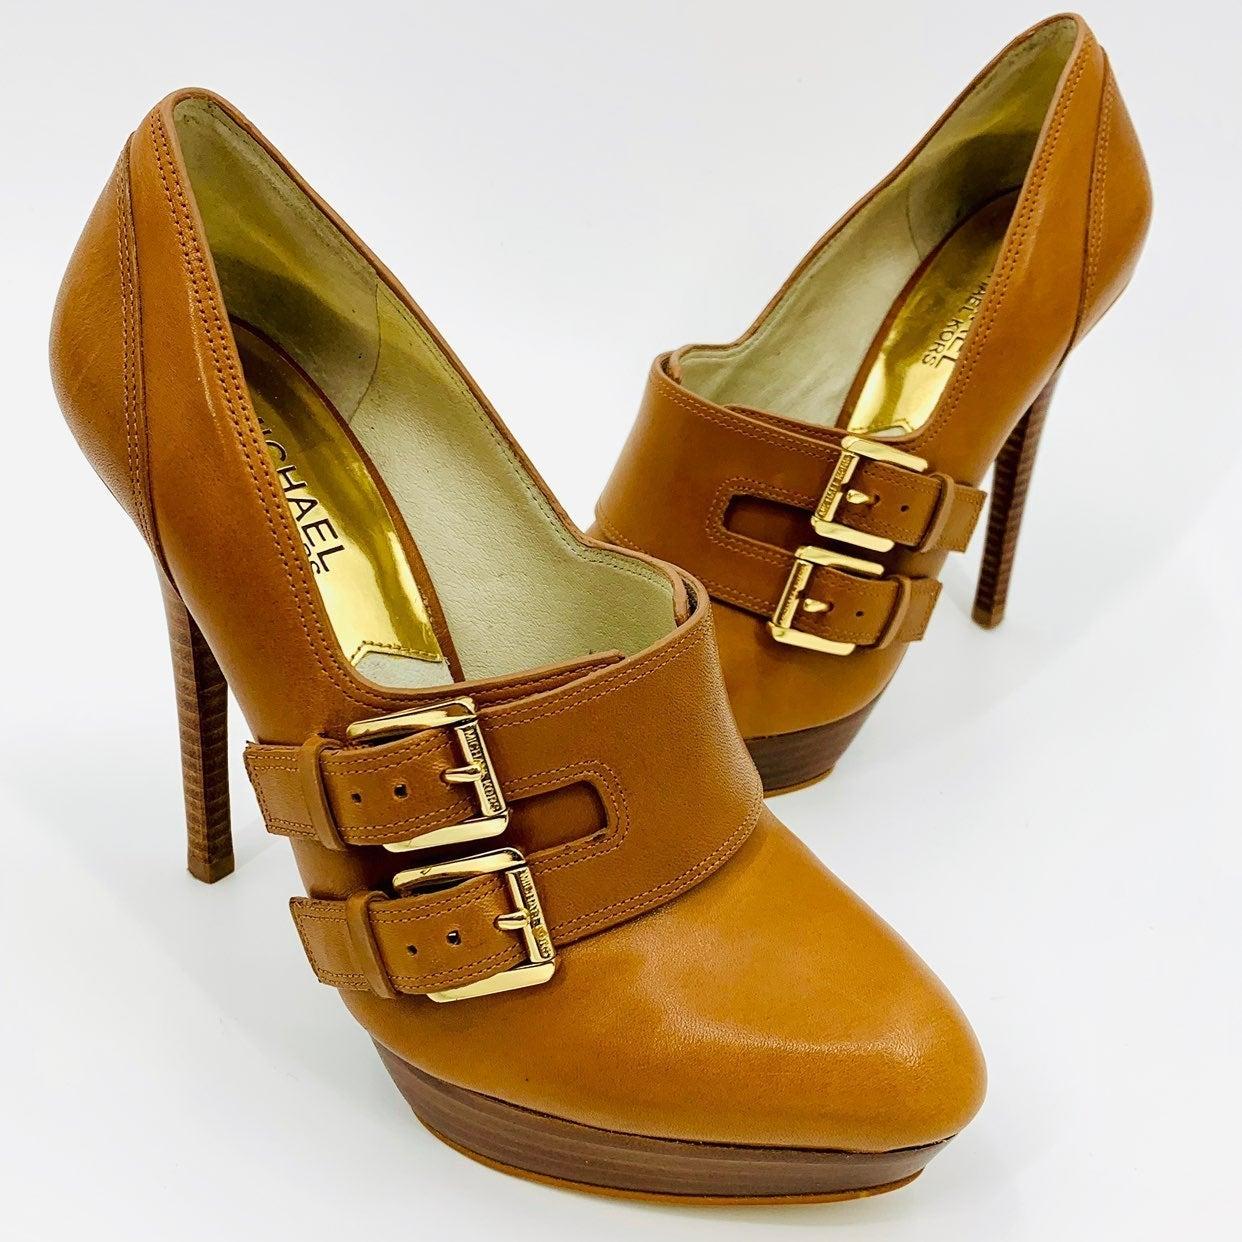 Michael kors 8 brown gold buckle heels